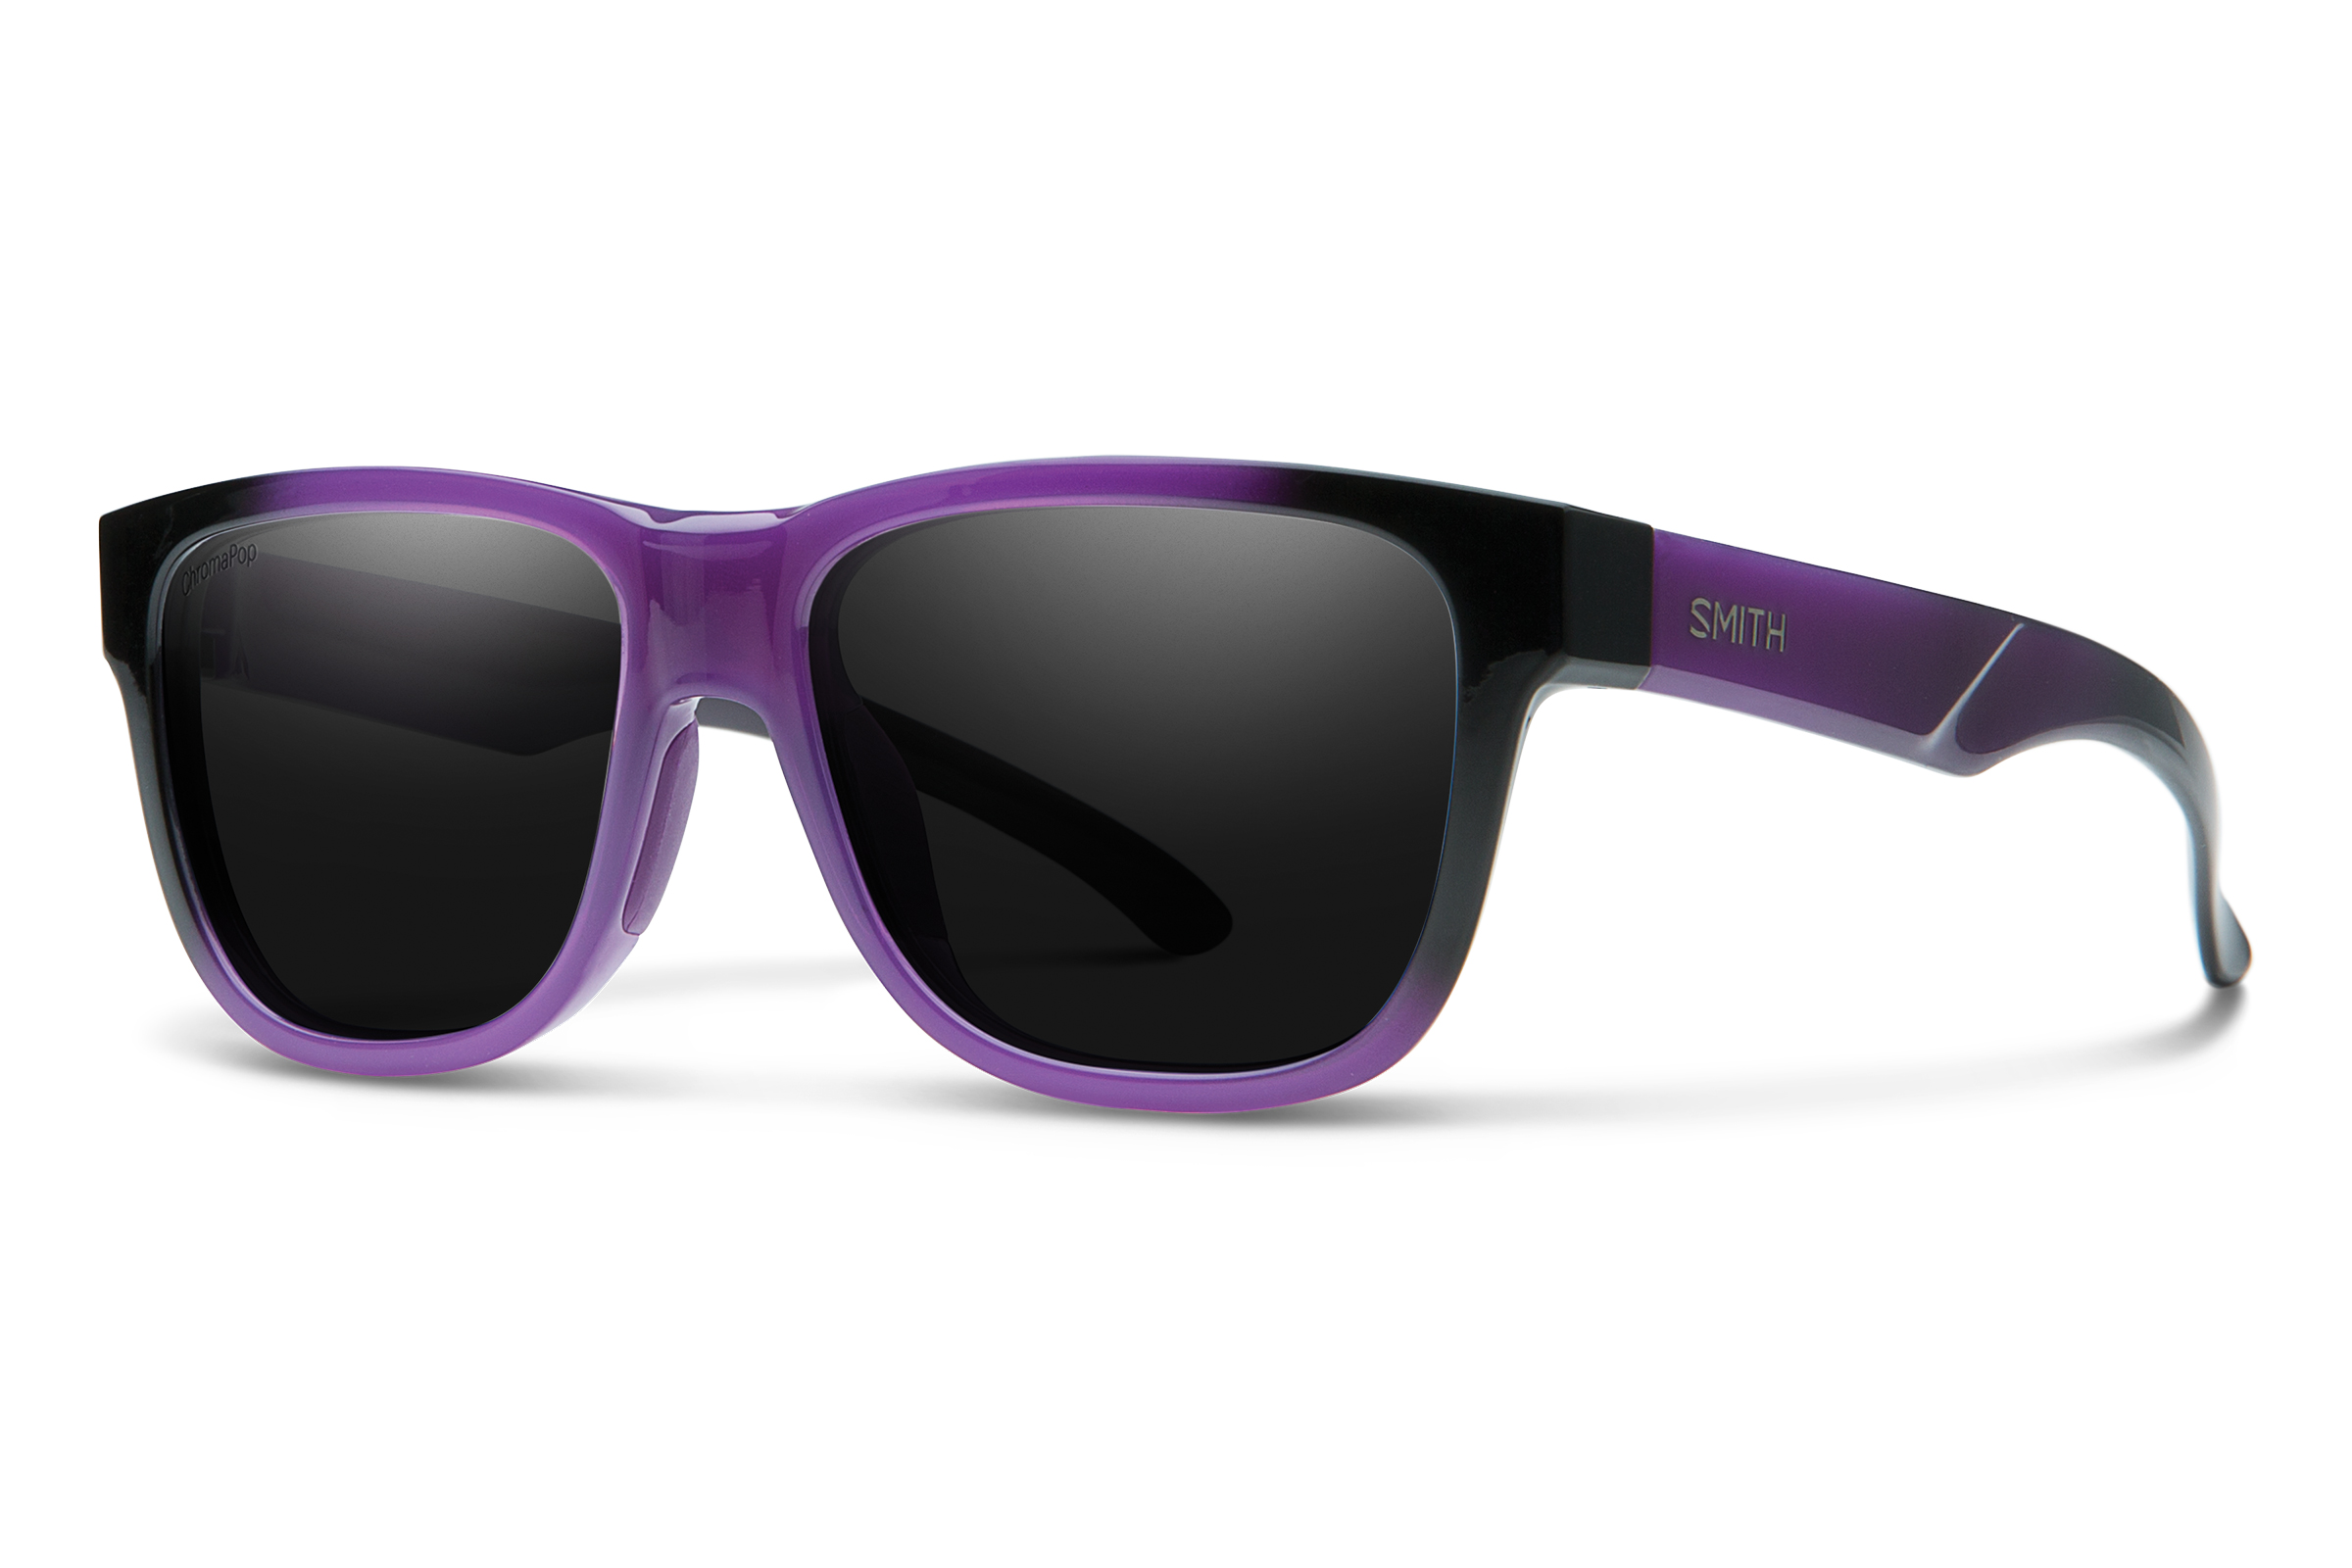 9b94f10f66 Smith Lowdown Slim 2 Chromapop Sunglasses -Men s